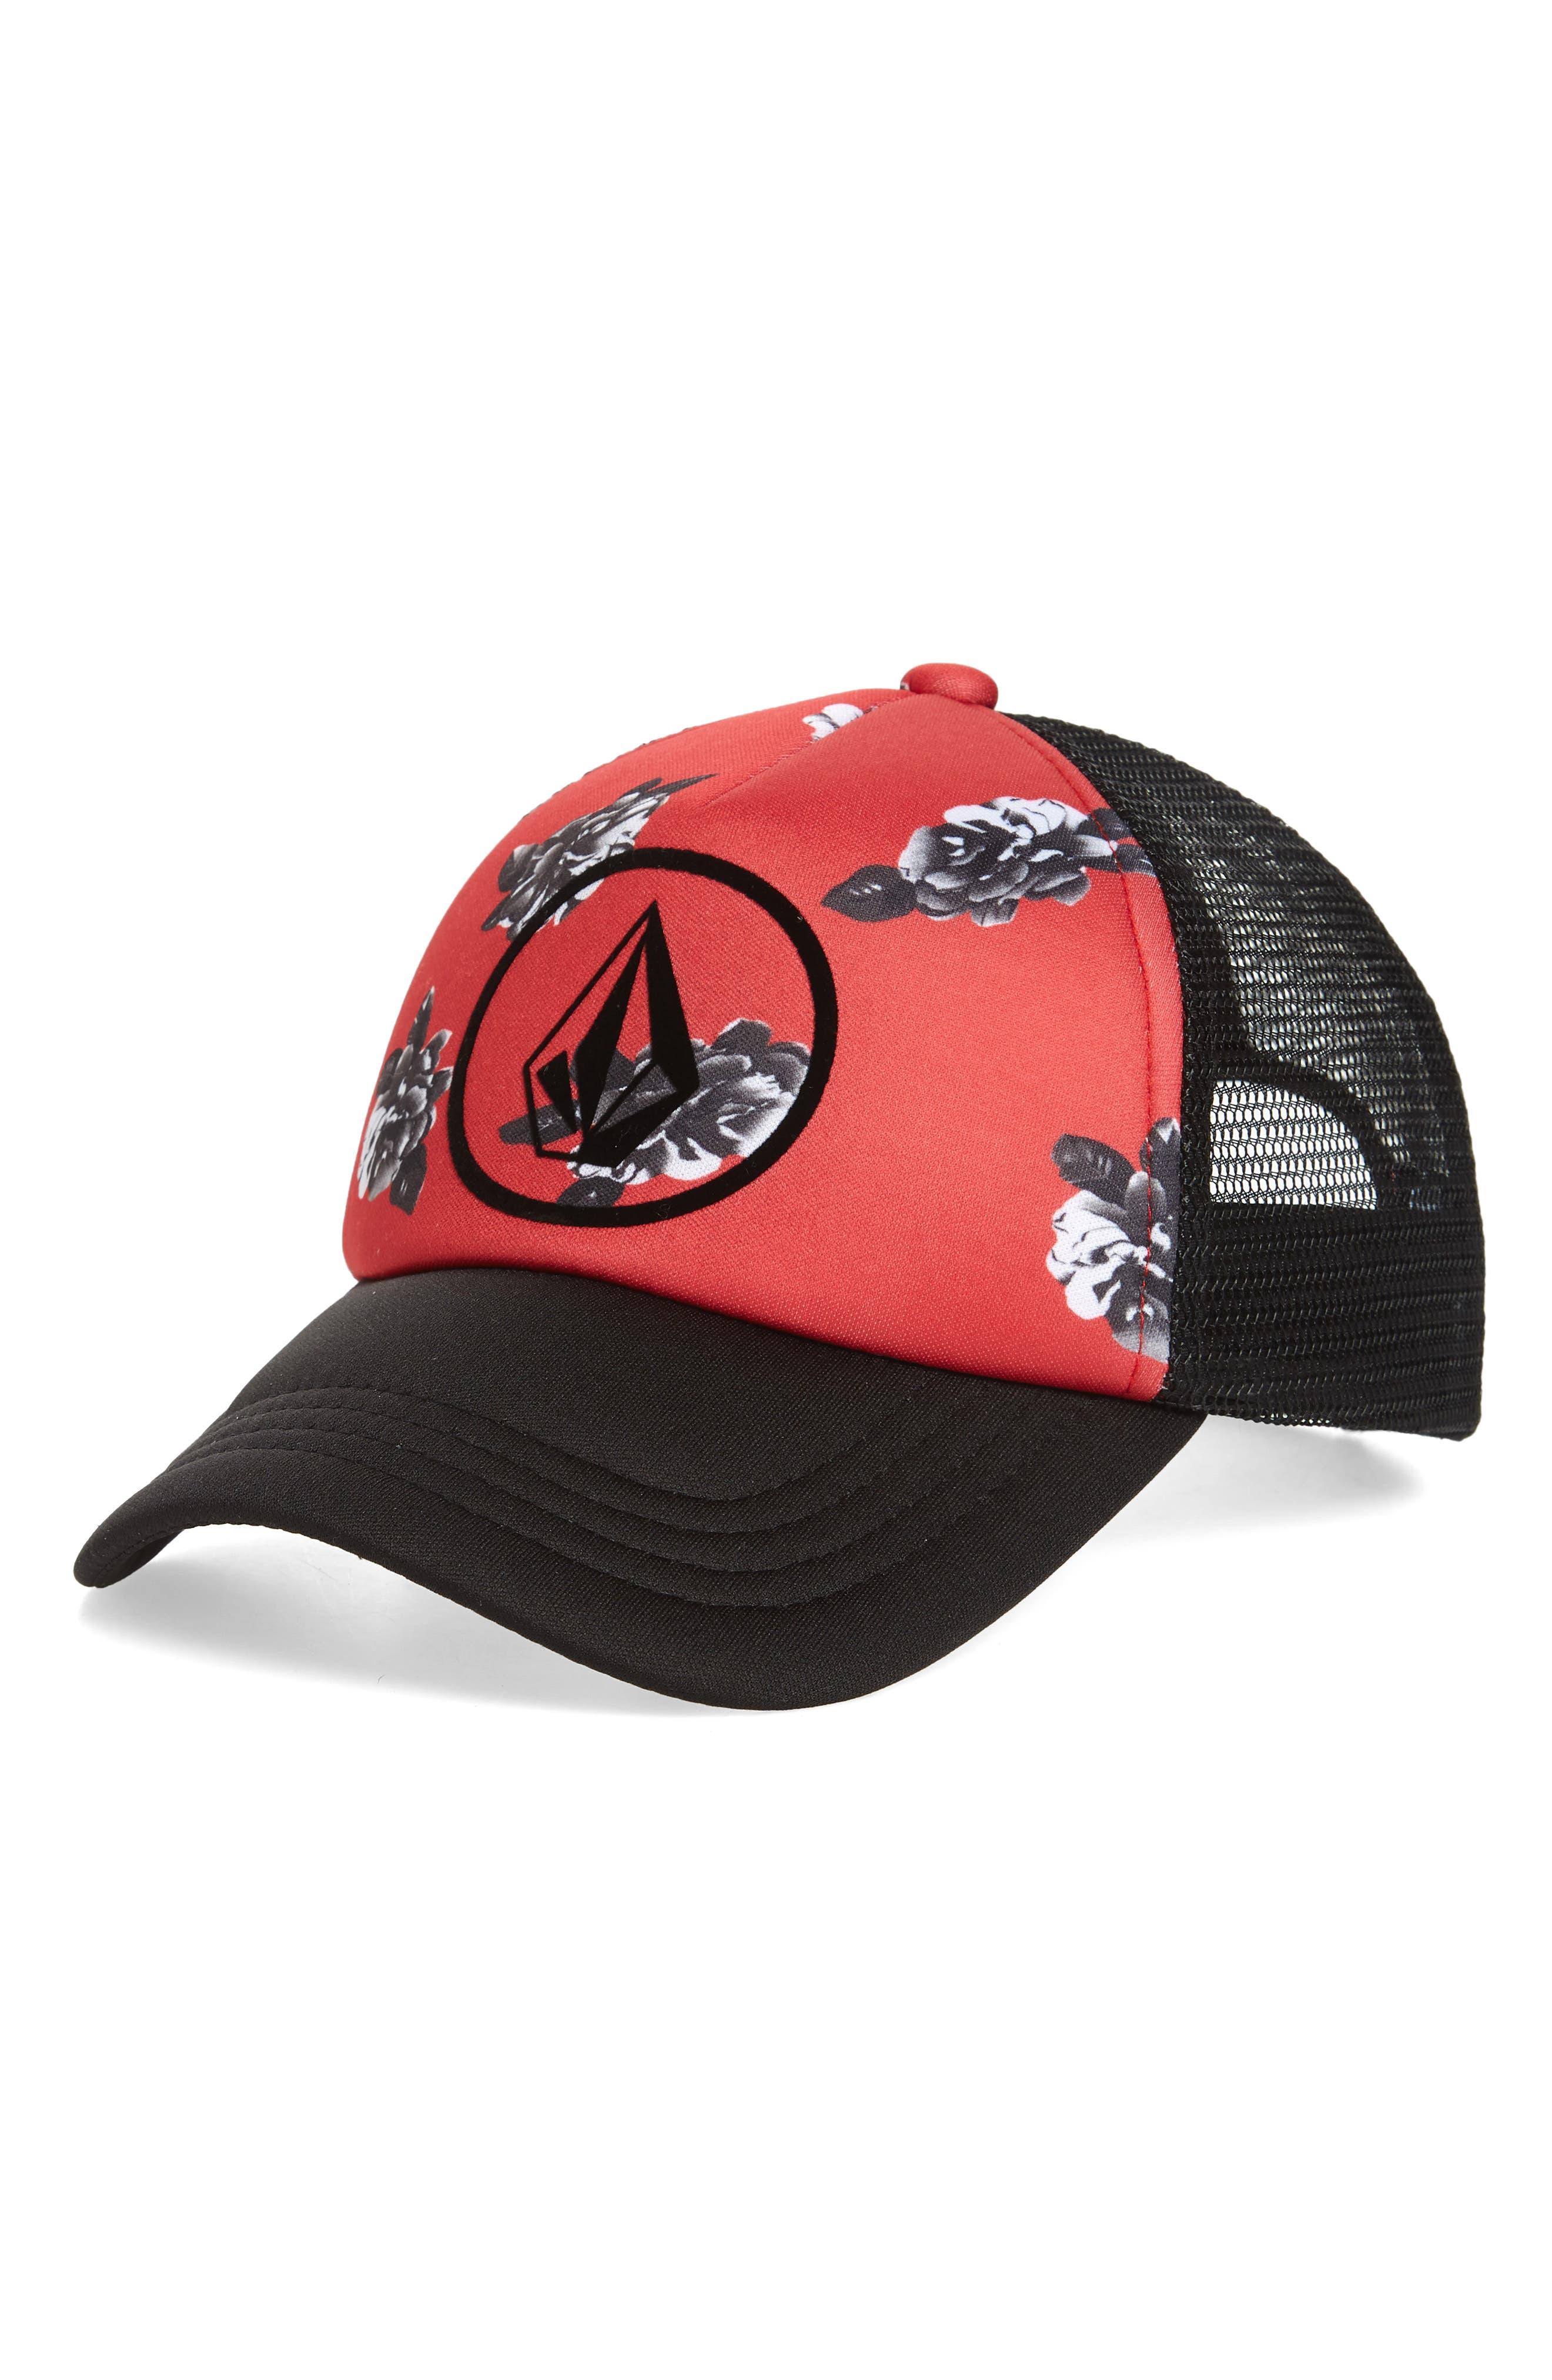 Tagurit Trucker Hat,                         Main,                         color, Red Rad